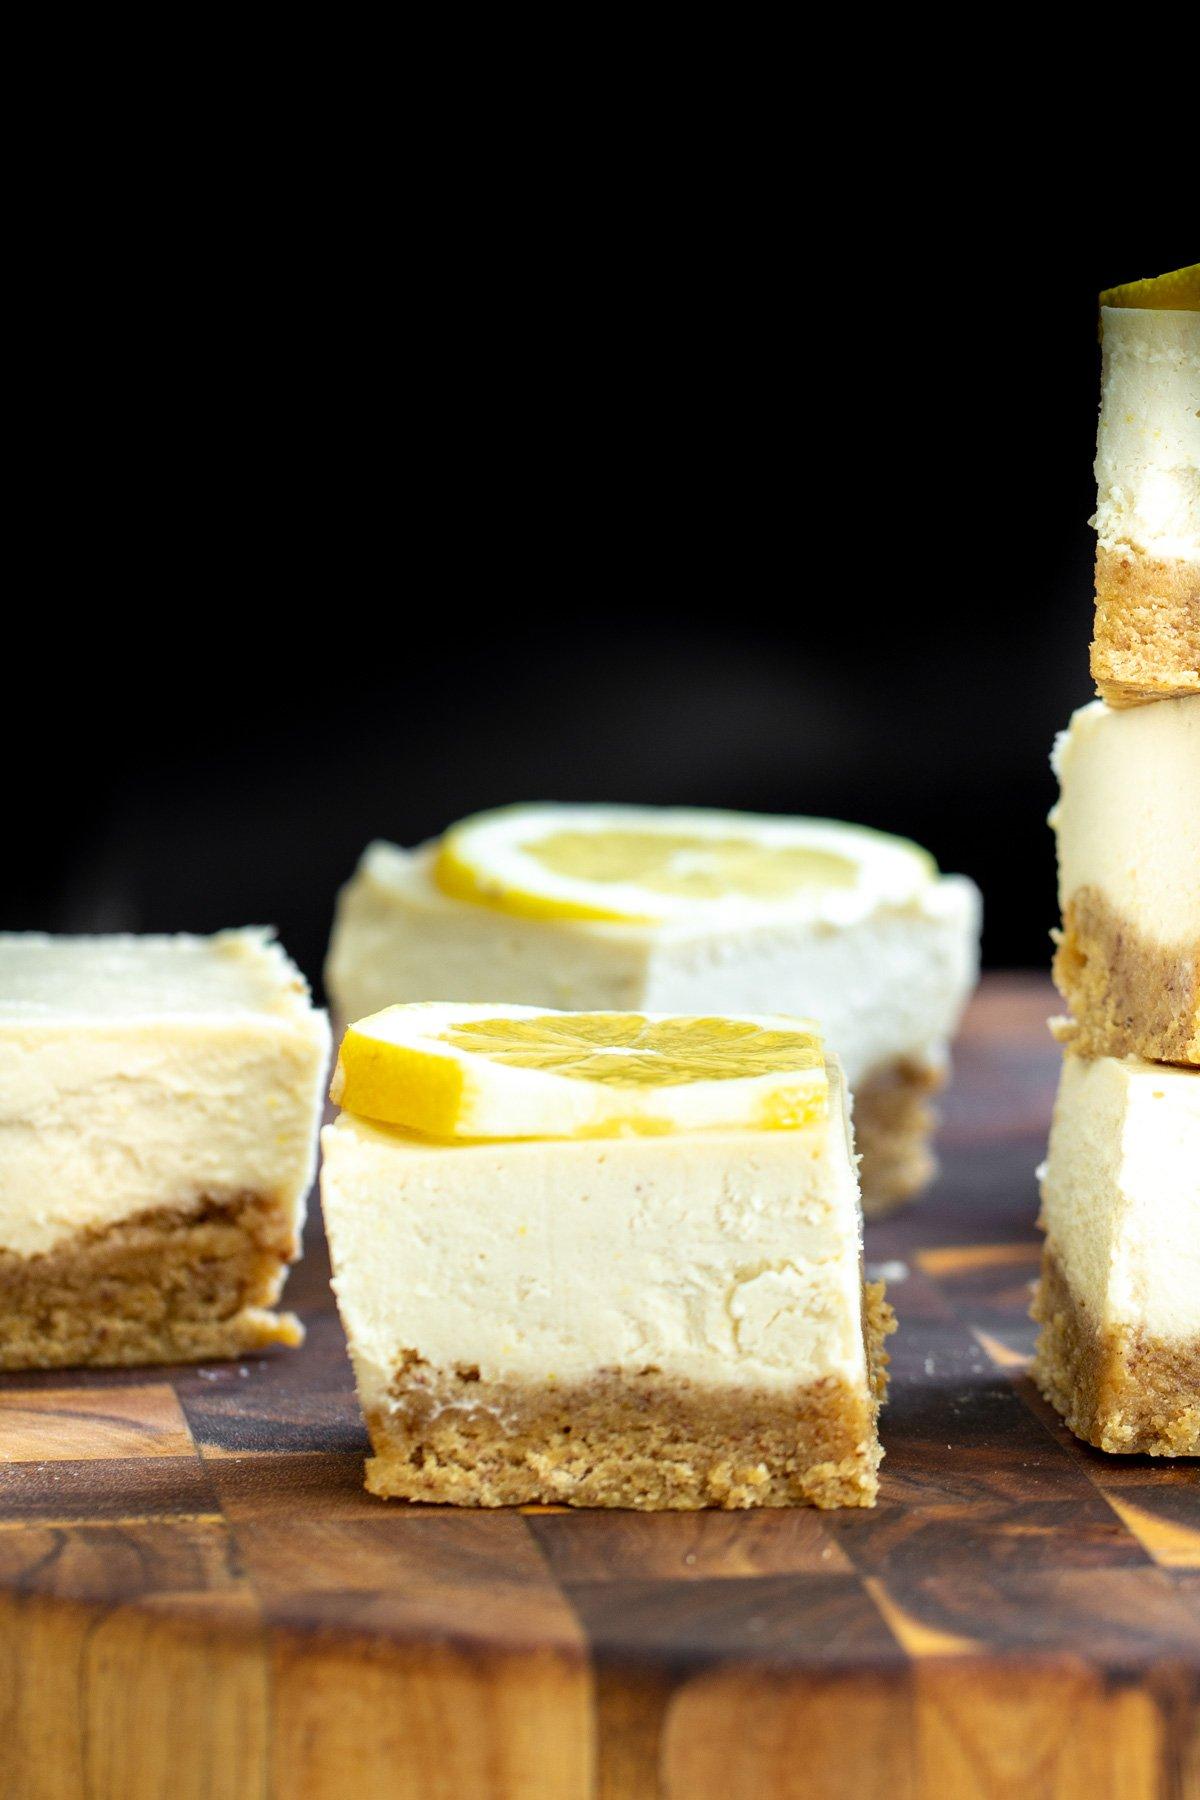 vegan lemon bars with glutenfree crust on a wooden chopping board